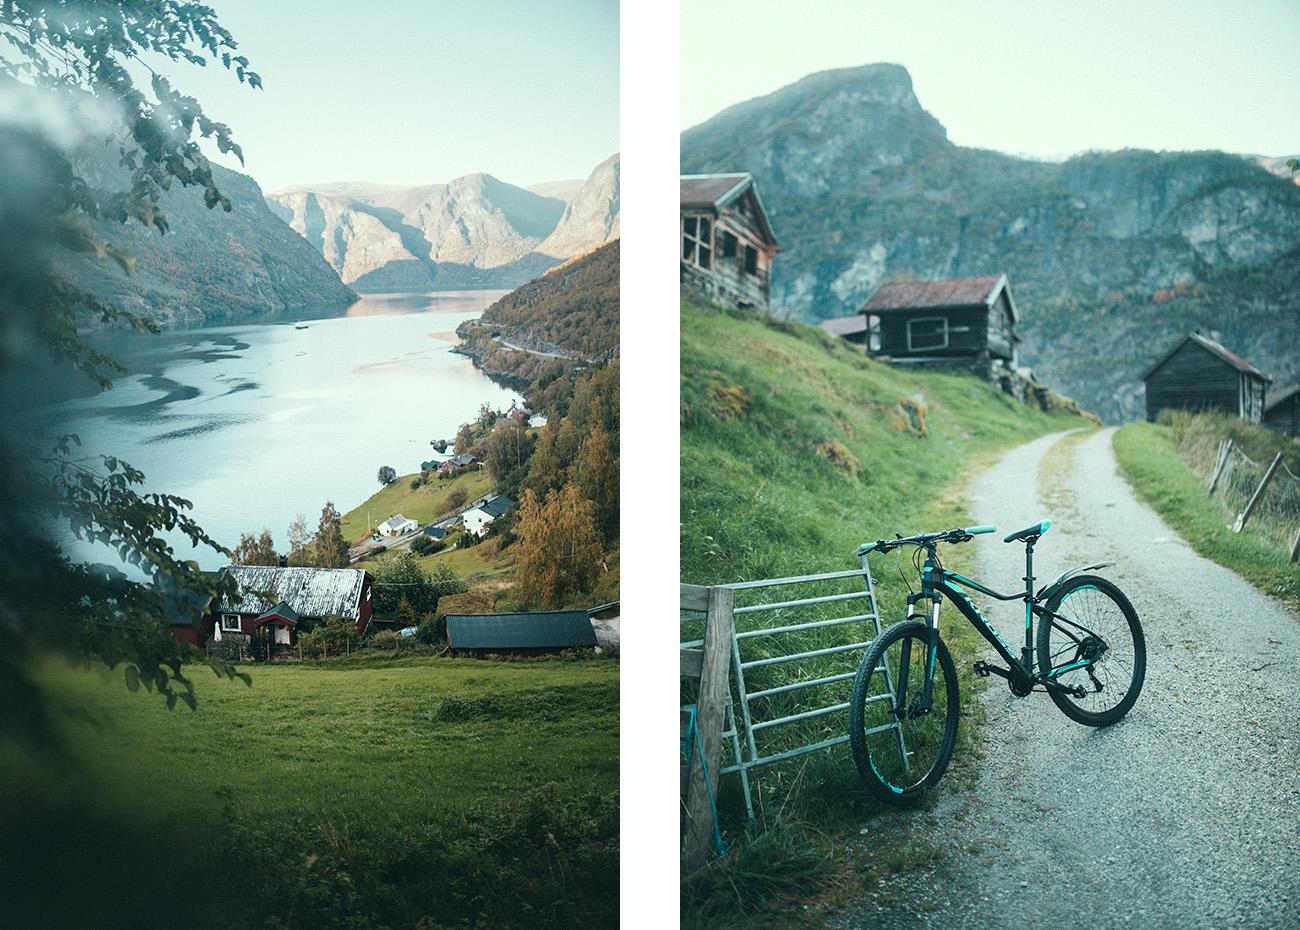 Otternes rowerem, Norwegia